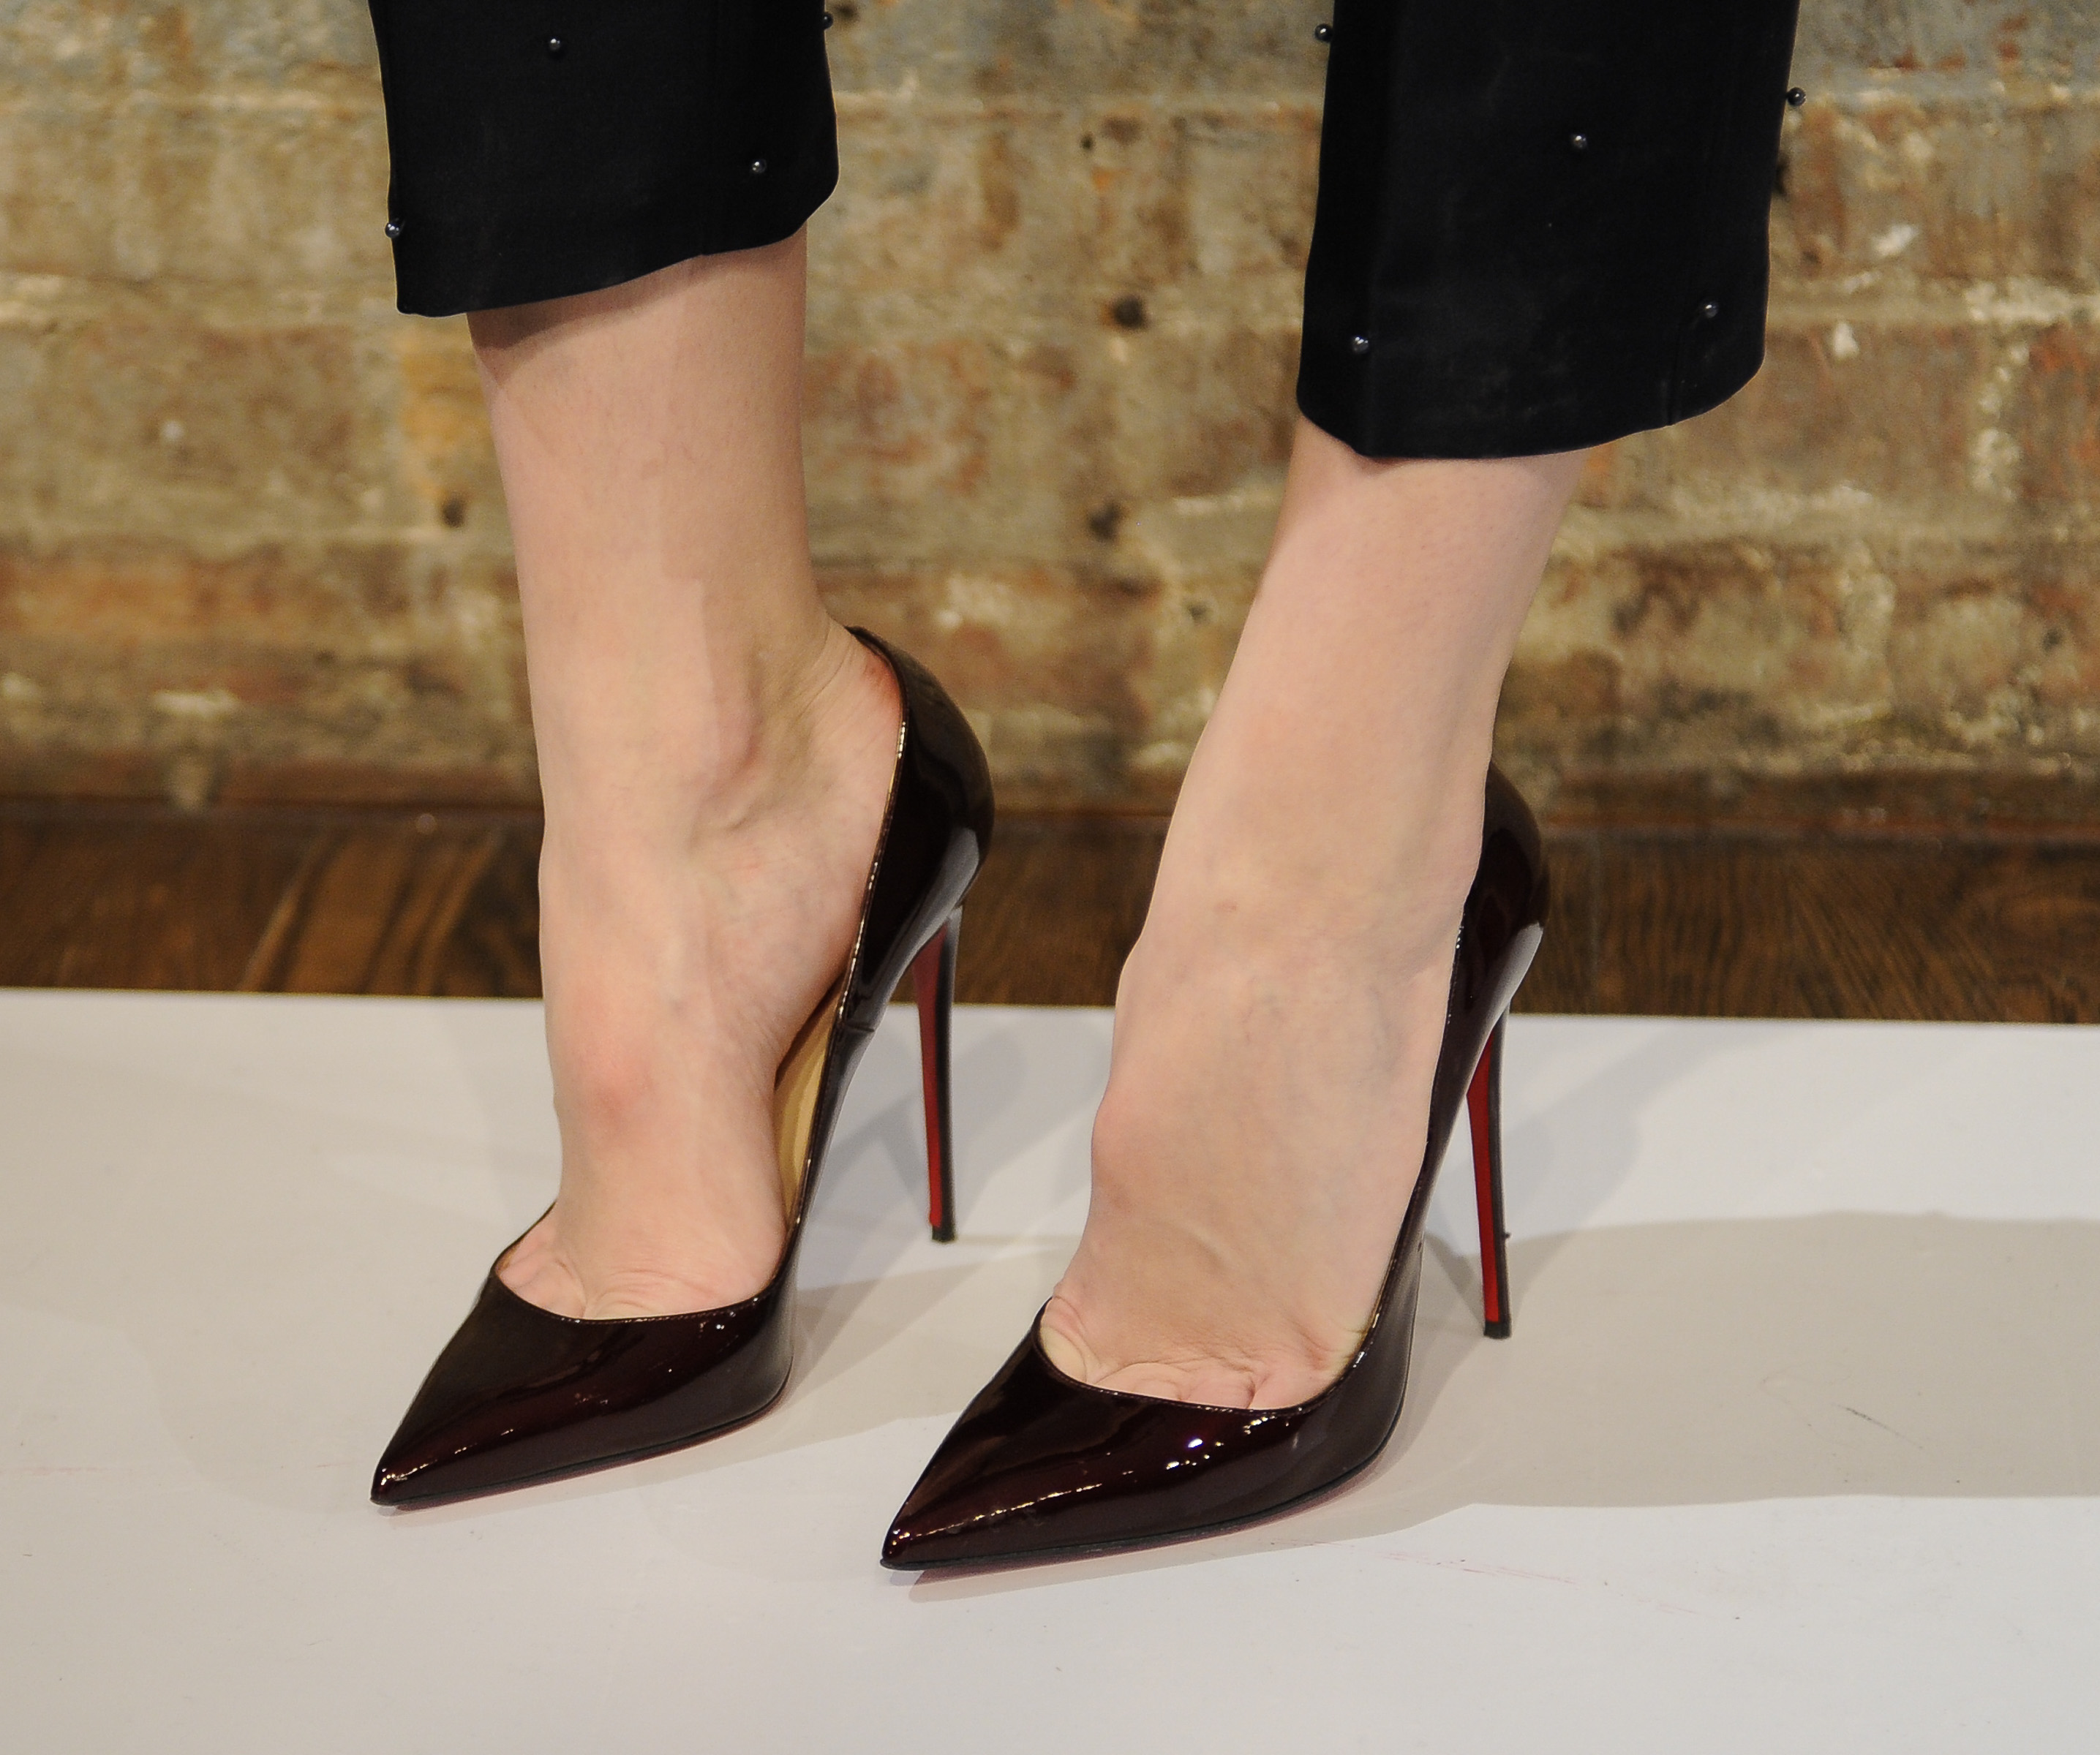 Nice feet in high heels